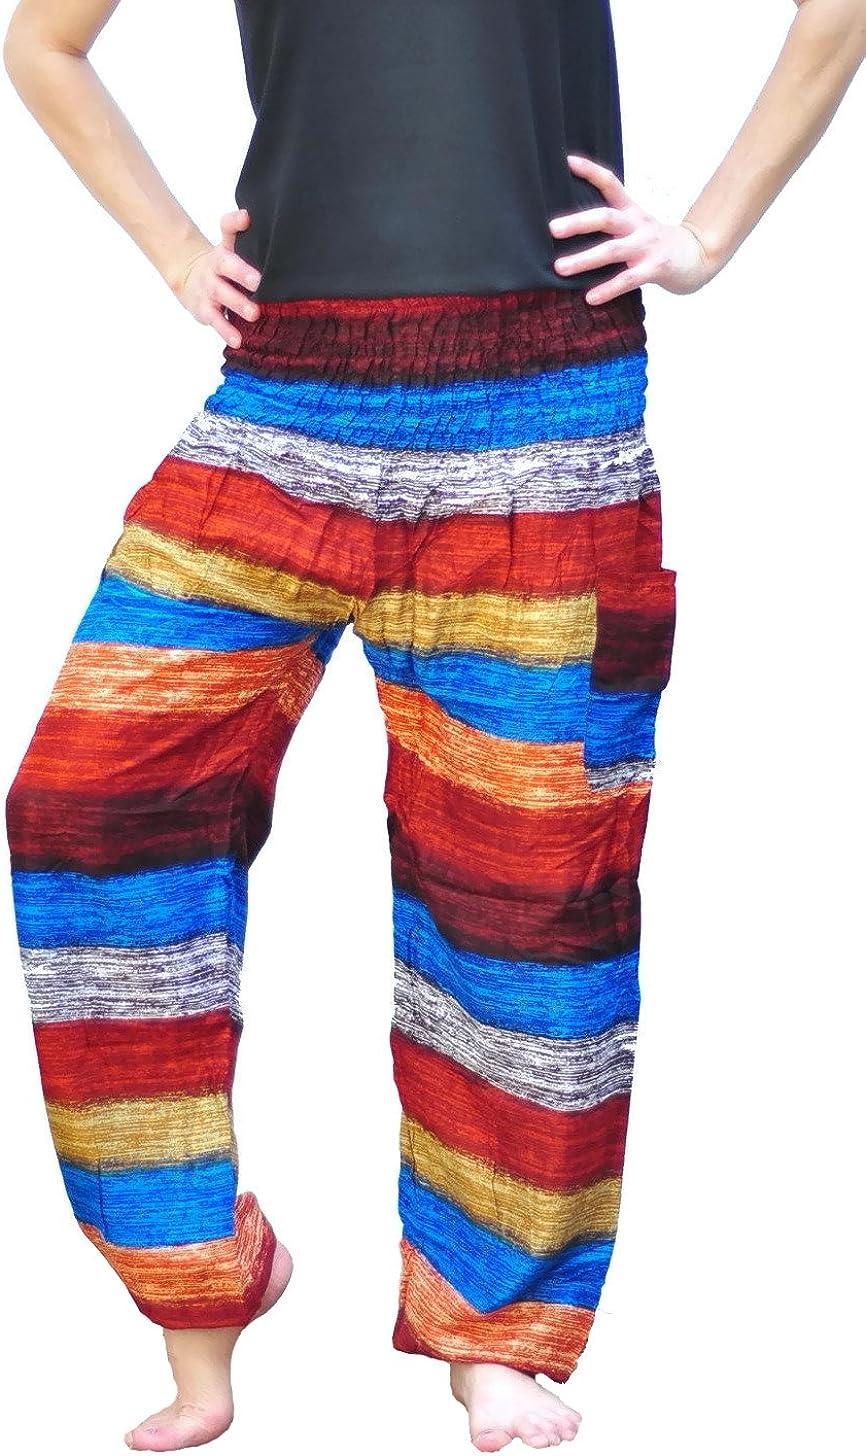 Thai-shaped cotton baby pants